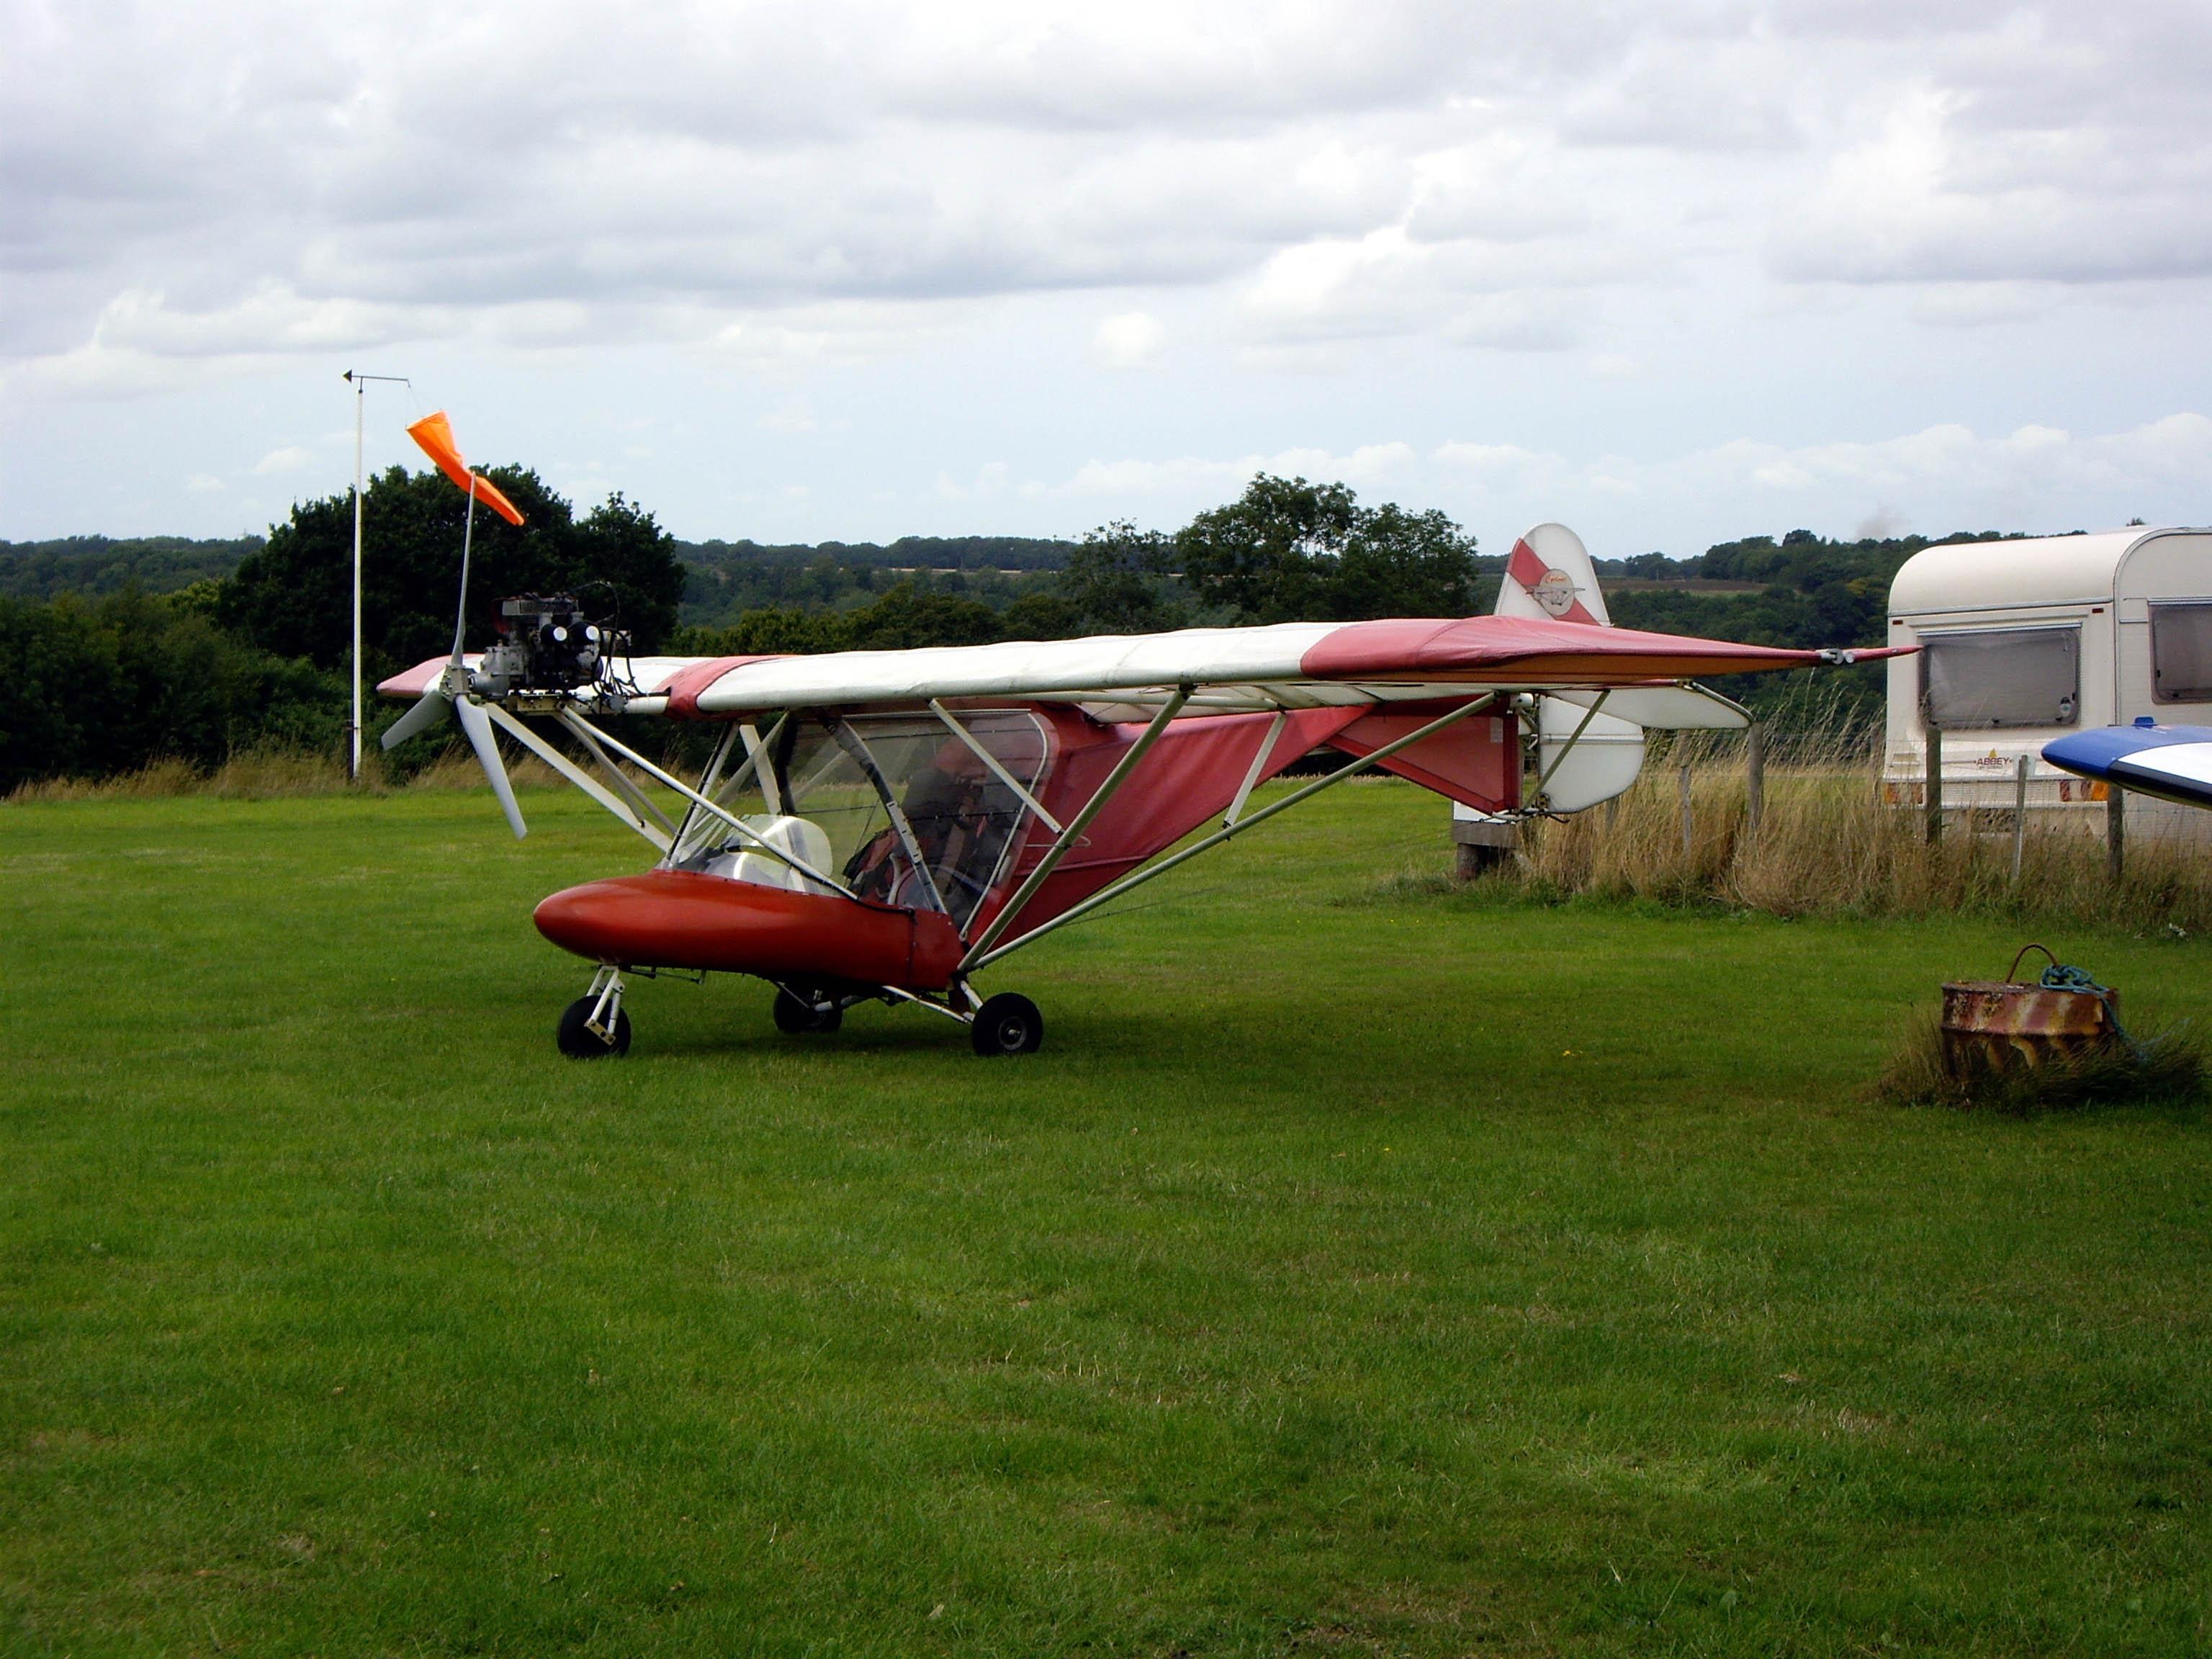 Cyclone AX3 G-MYRO Check-Flight, Clipgate Farm